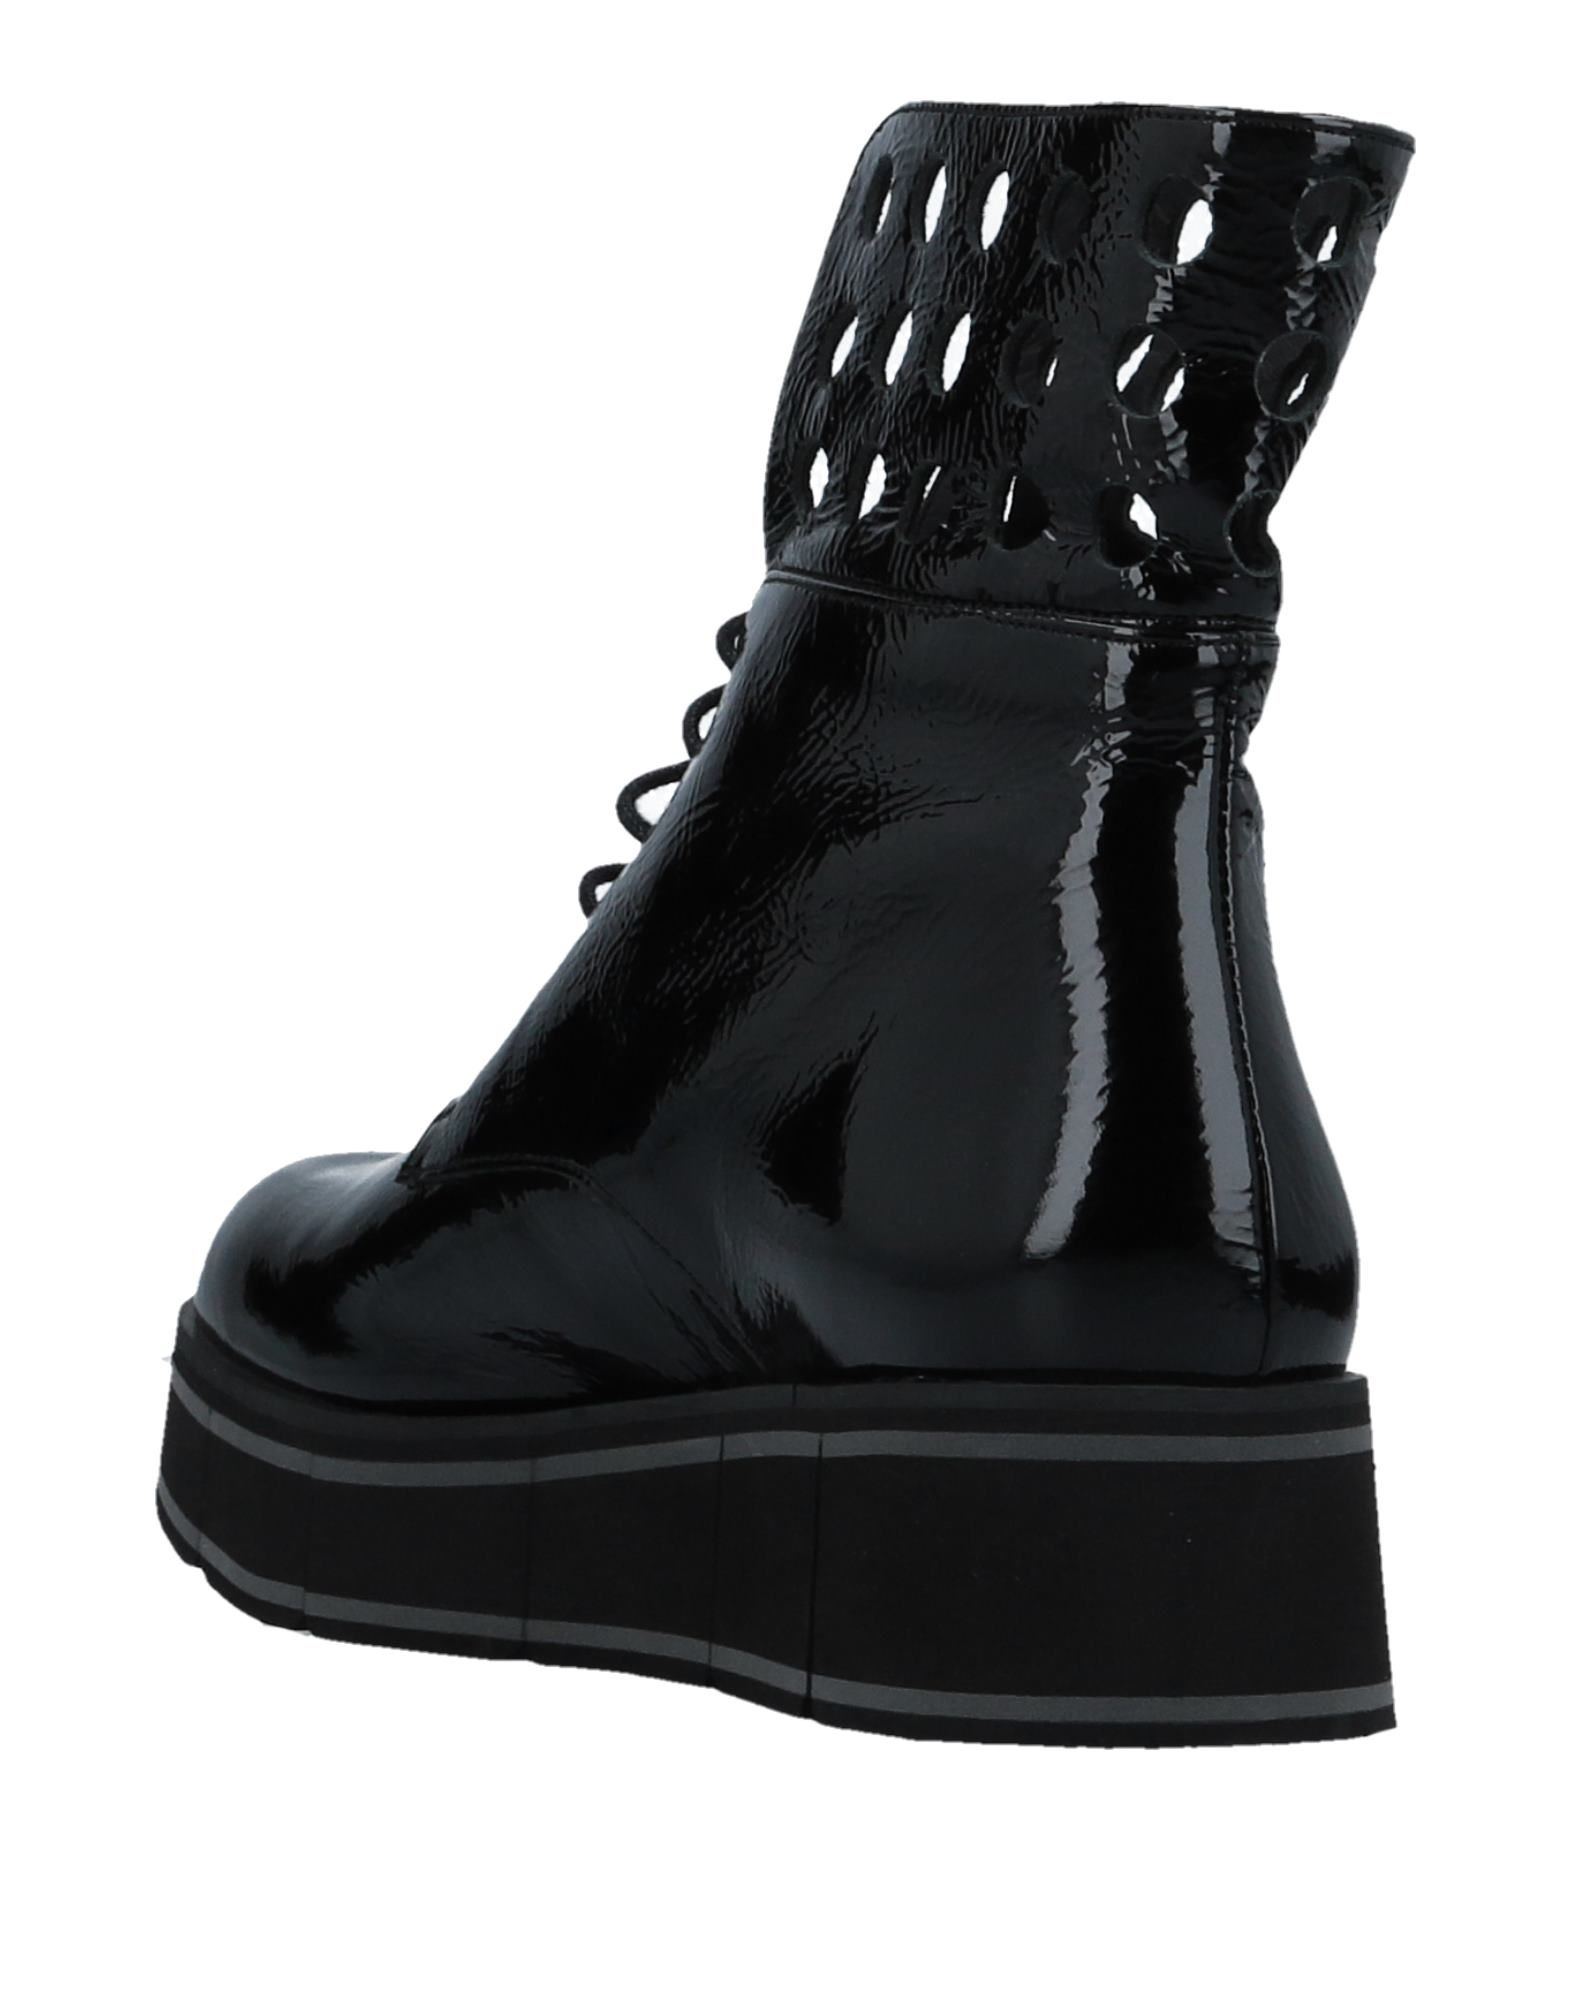 Stilvolle billige Schuhe Paloma  Barceló Stiefelette Damen  Paloma 11510421KW ce8d28